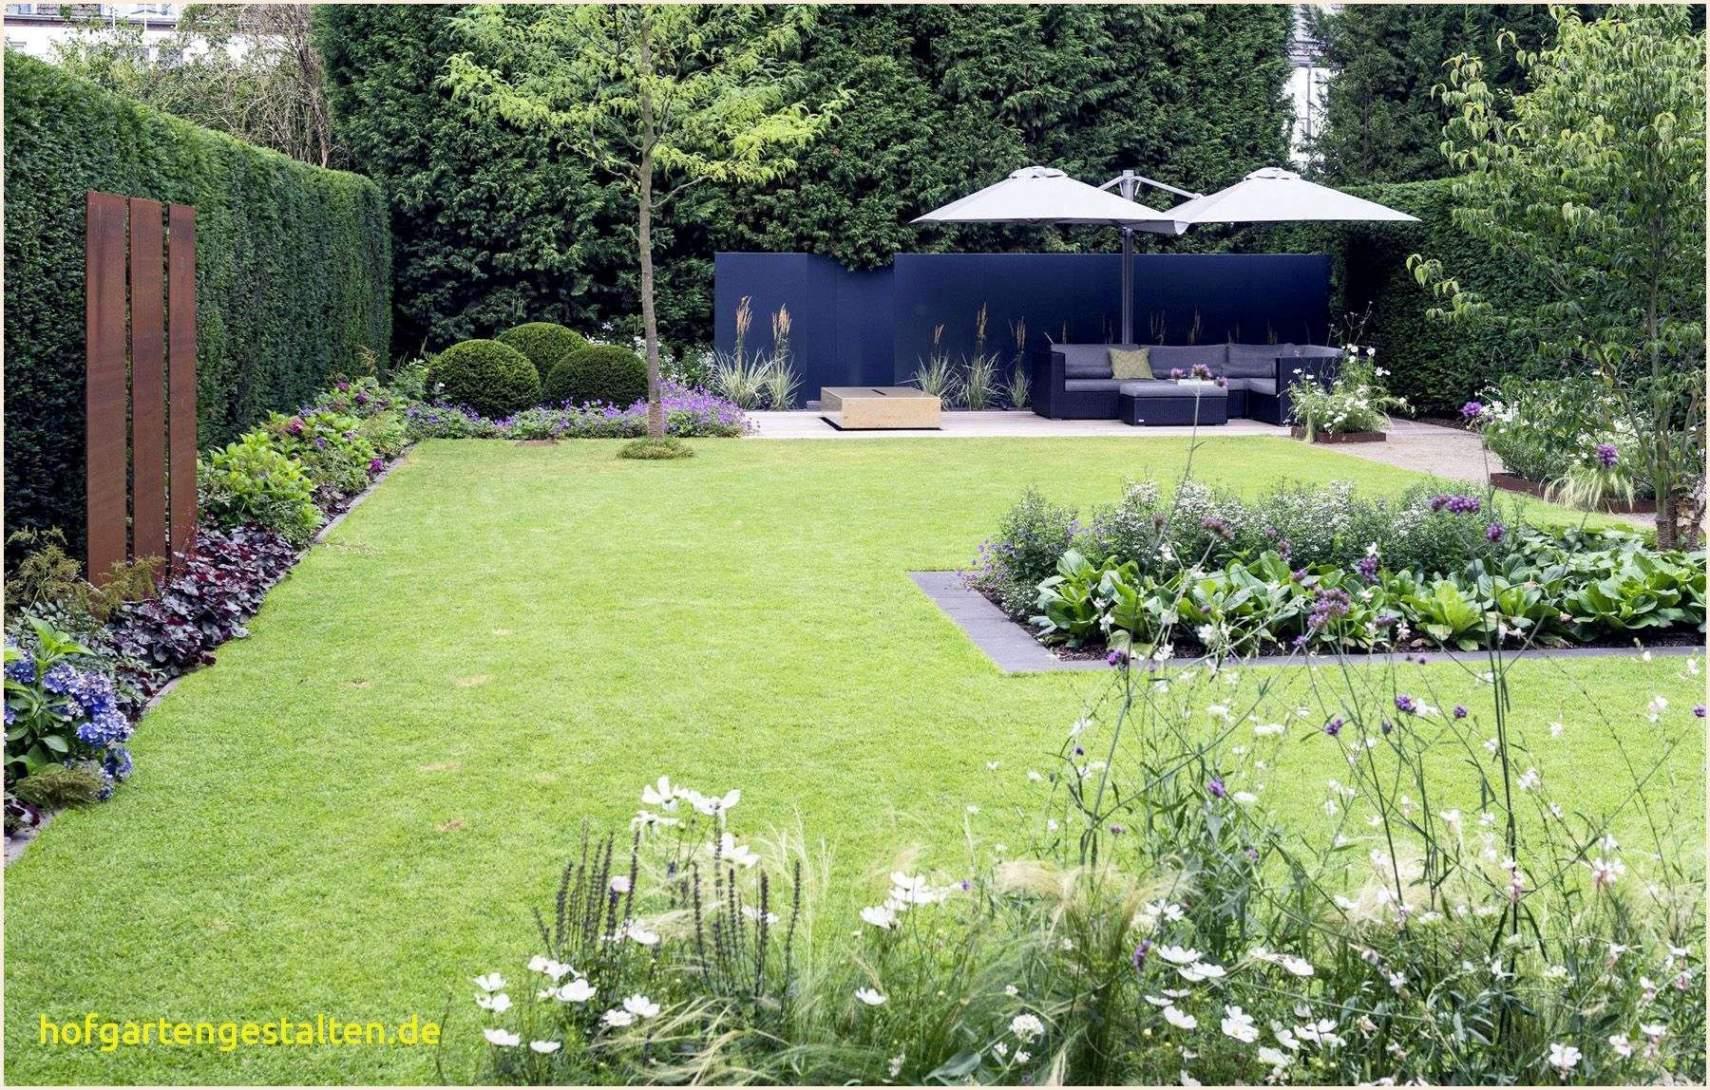 garten berlin frisch zimmerpflanzen gros modern temobardz home blog of garten berlin